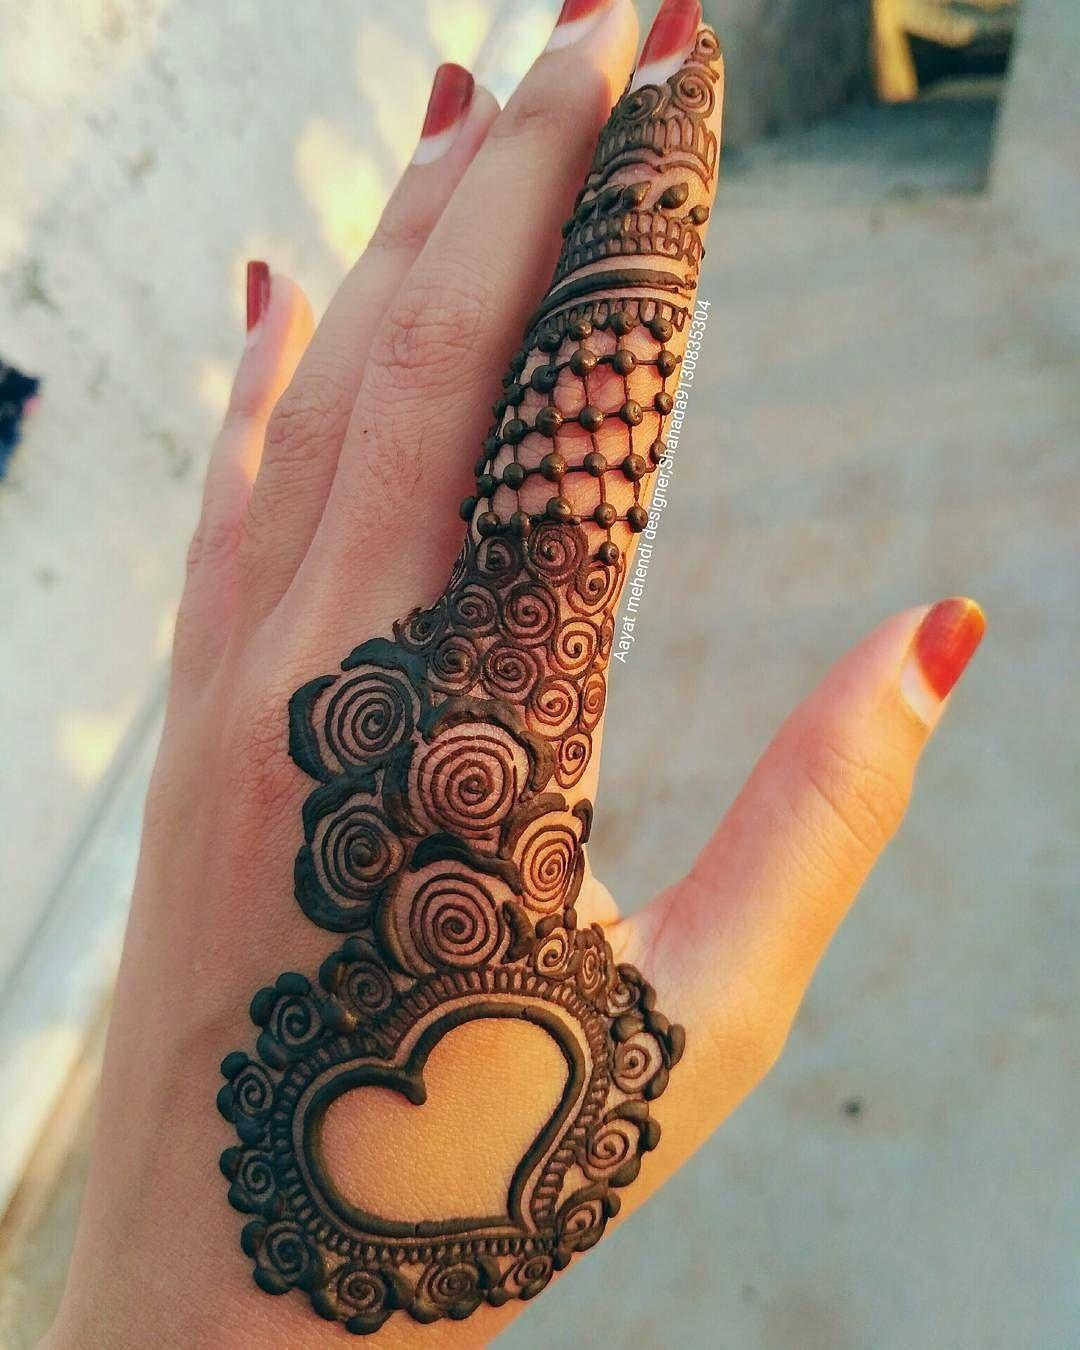 Pin By Tashamid0011 On Unique Mehndi Designs Mehndi Henna